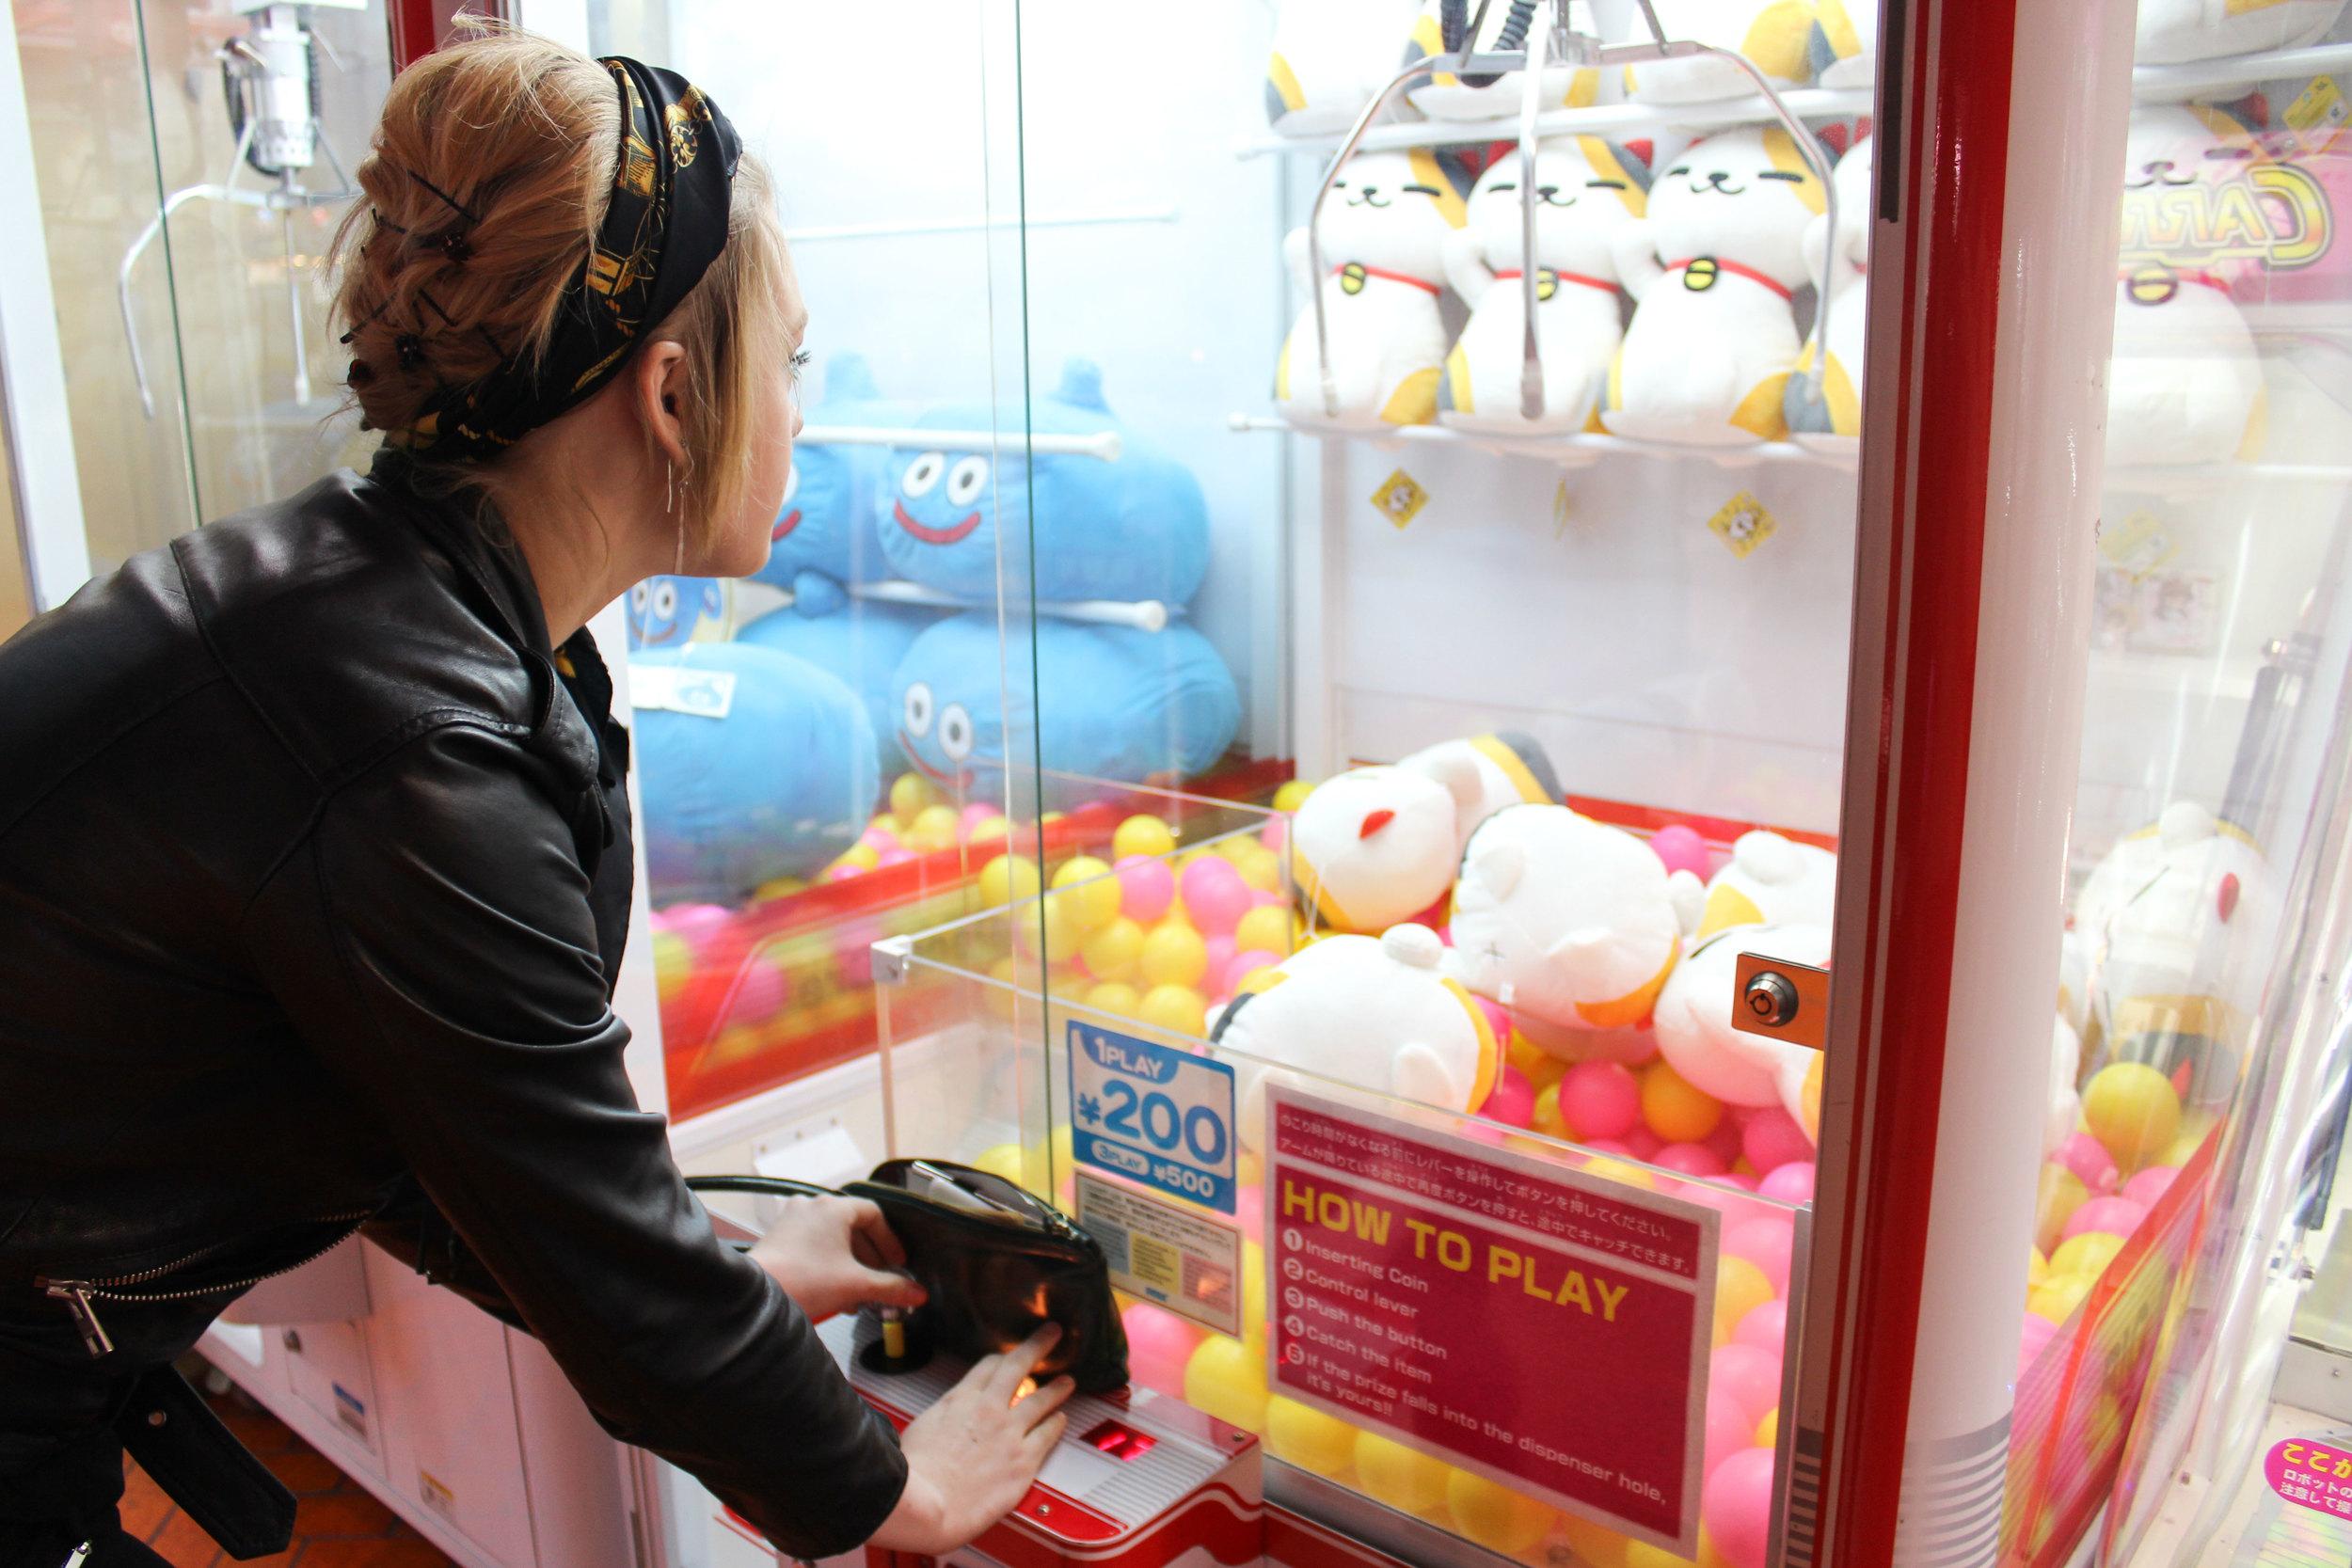 We spent 500 yen failing to acquire a stuffed cat